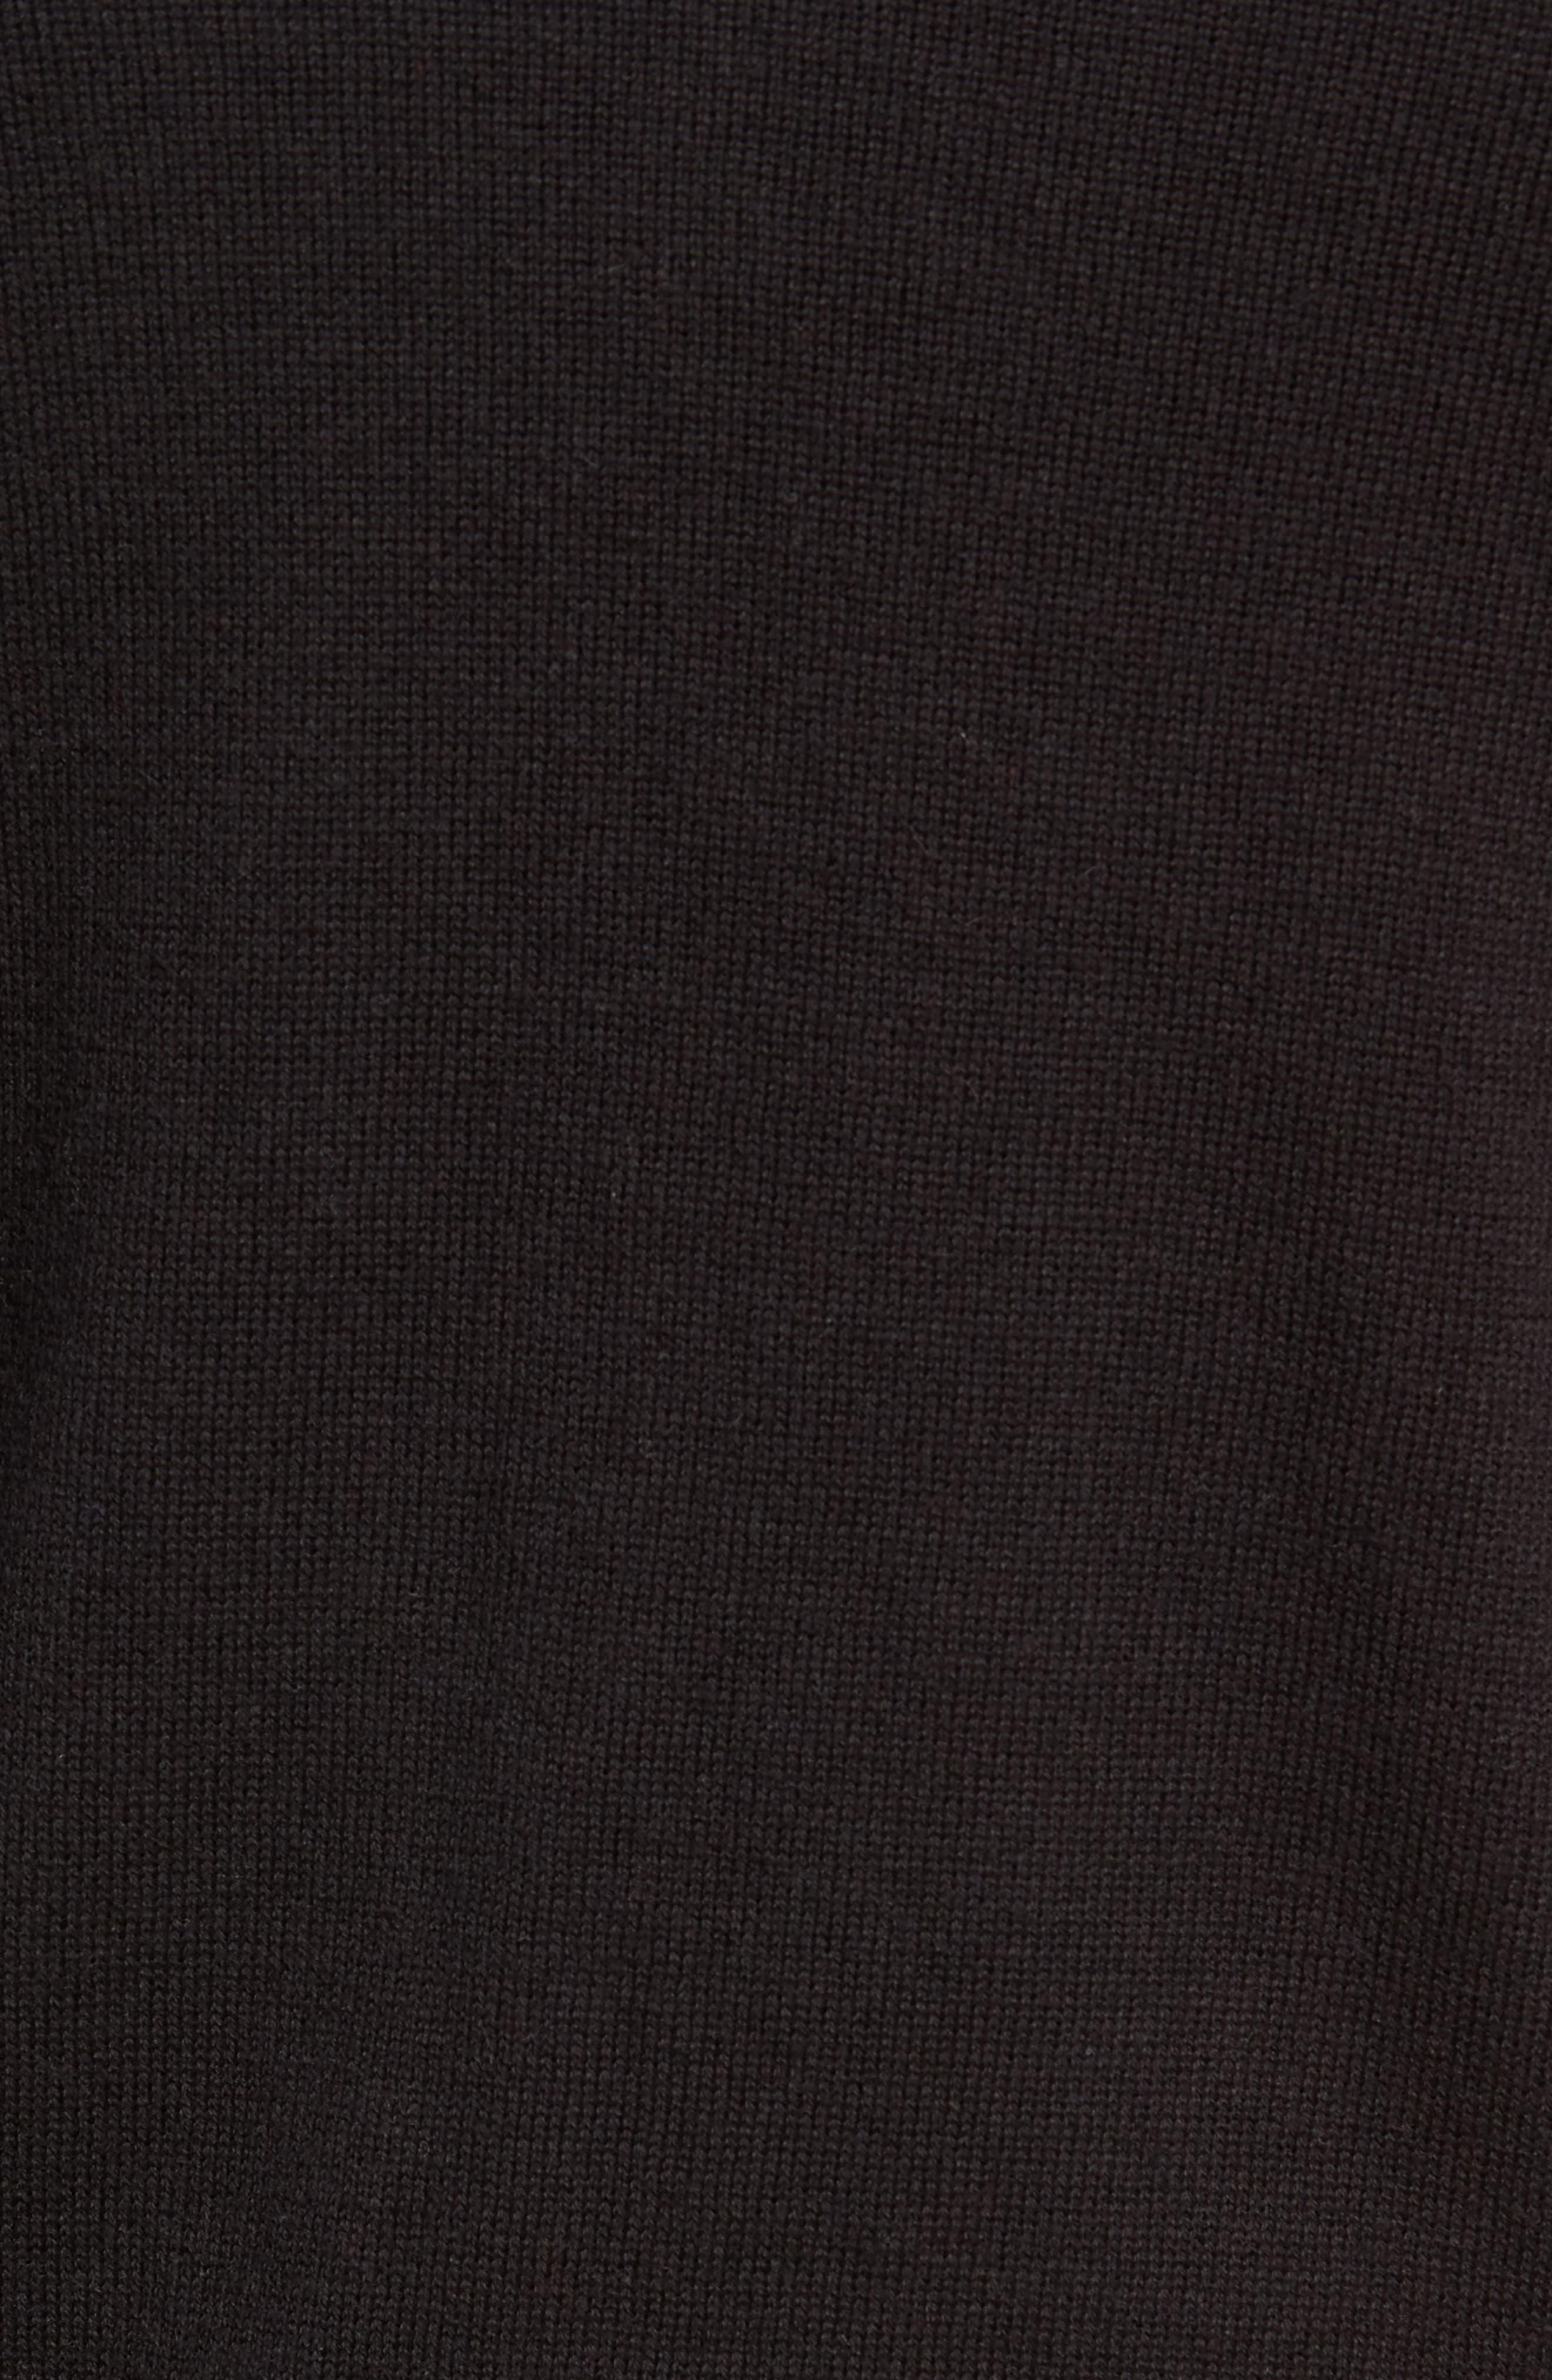 Palm Beach Quarter-Zip Sweater,                             Alternate thumbnail 5, color,                             JET BLACK